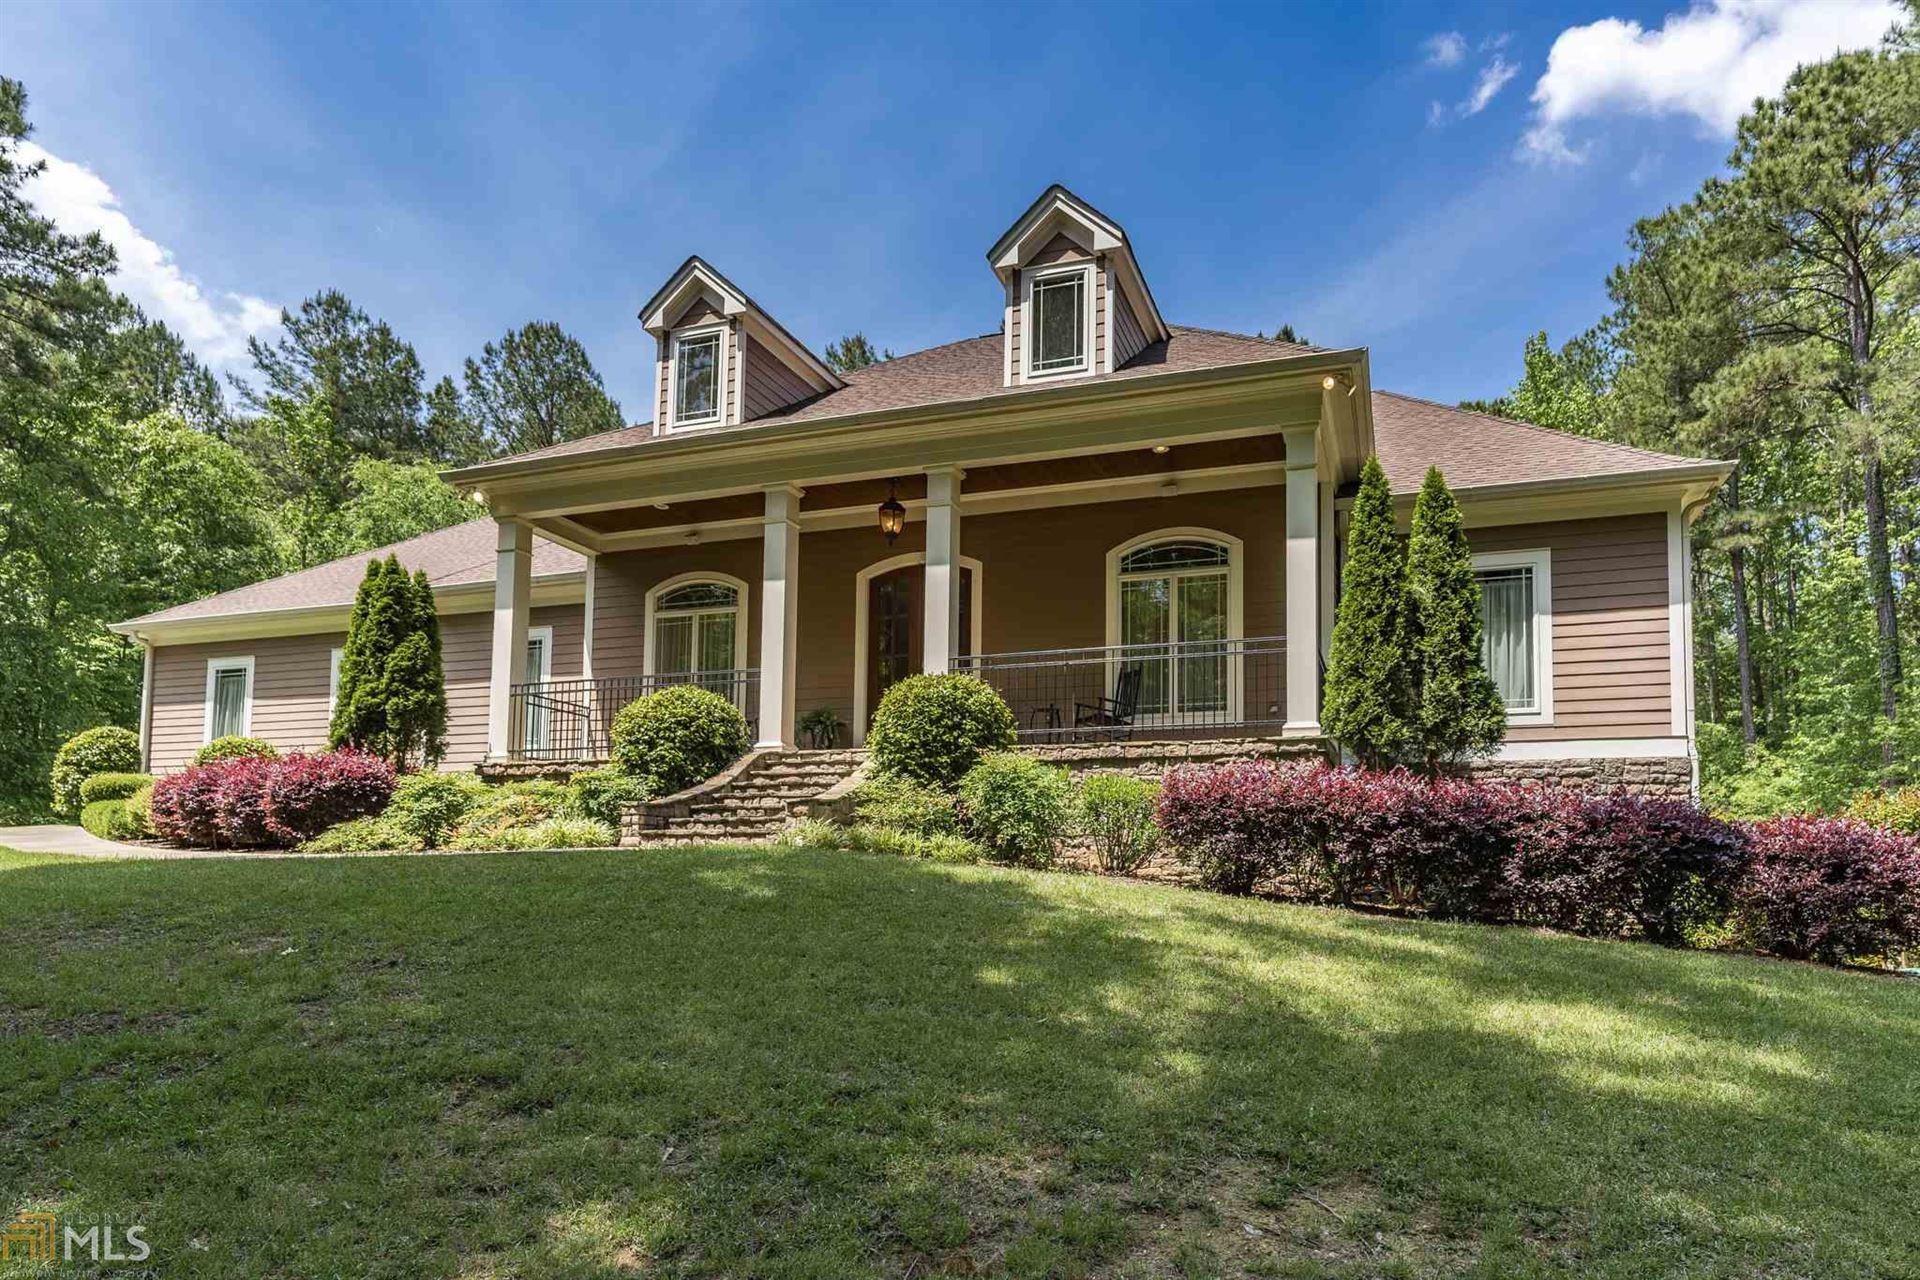 1071 Forest Hts, Greensboro, GA 30642 - #: 8811863